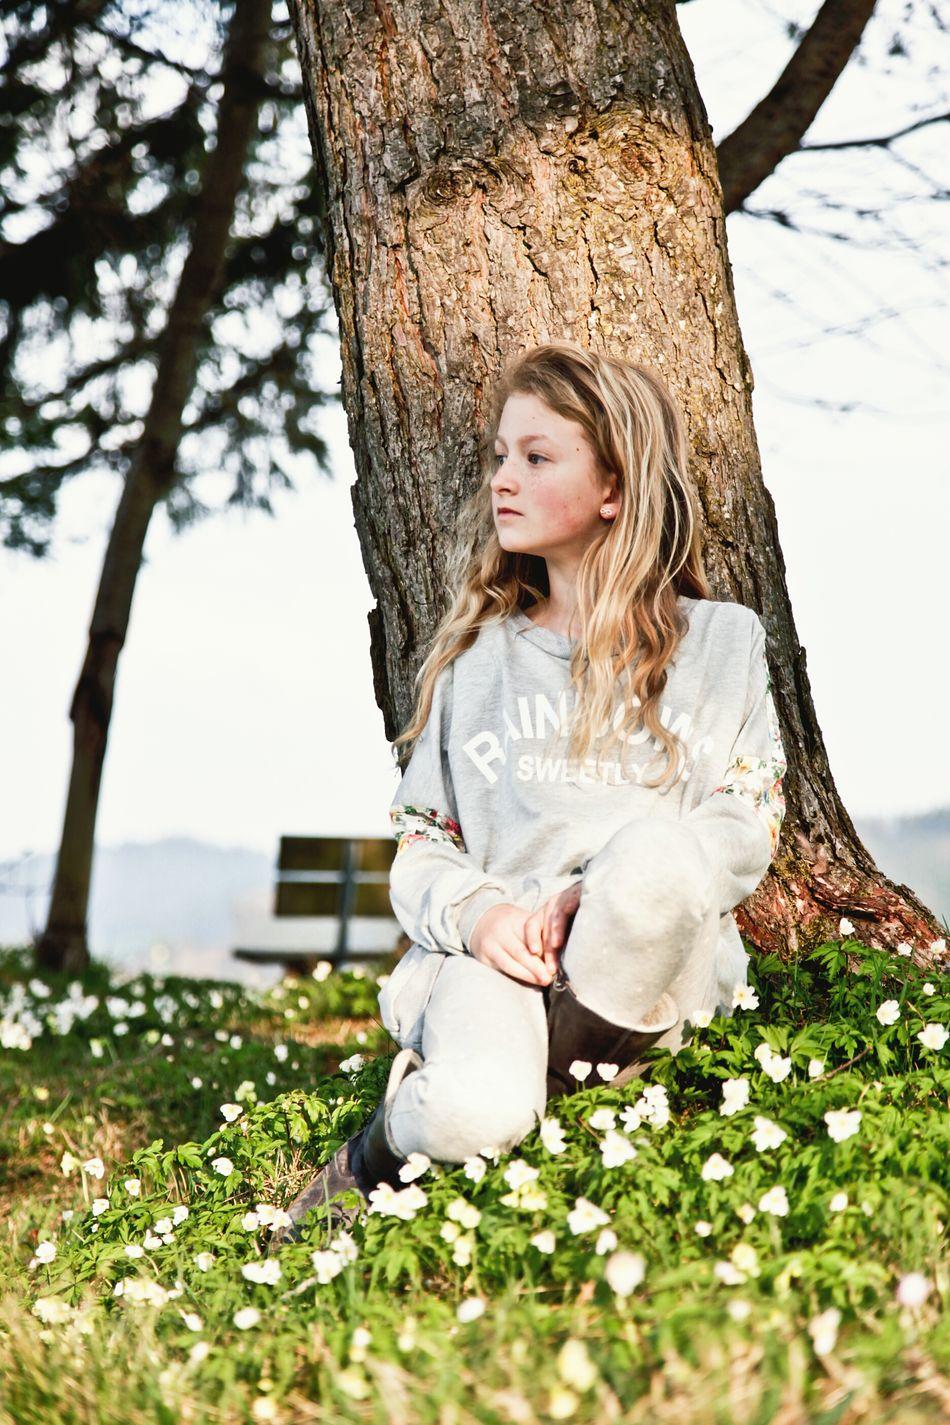 Girl Spring Springtime Flower Blond Hair One Girl Only People Beautiful People Teen Teenager Teenage Girls Lifestyle Lifestyles Long Hair Enjoying Life Real People Tree Sitting Sitting Outside Sitting In The Sun EyeEmNewHere Resist Art Is Everywhere Long Goodbye